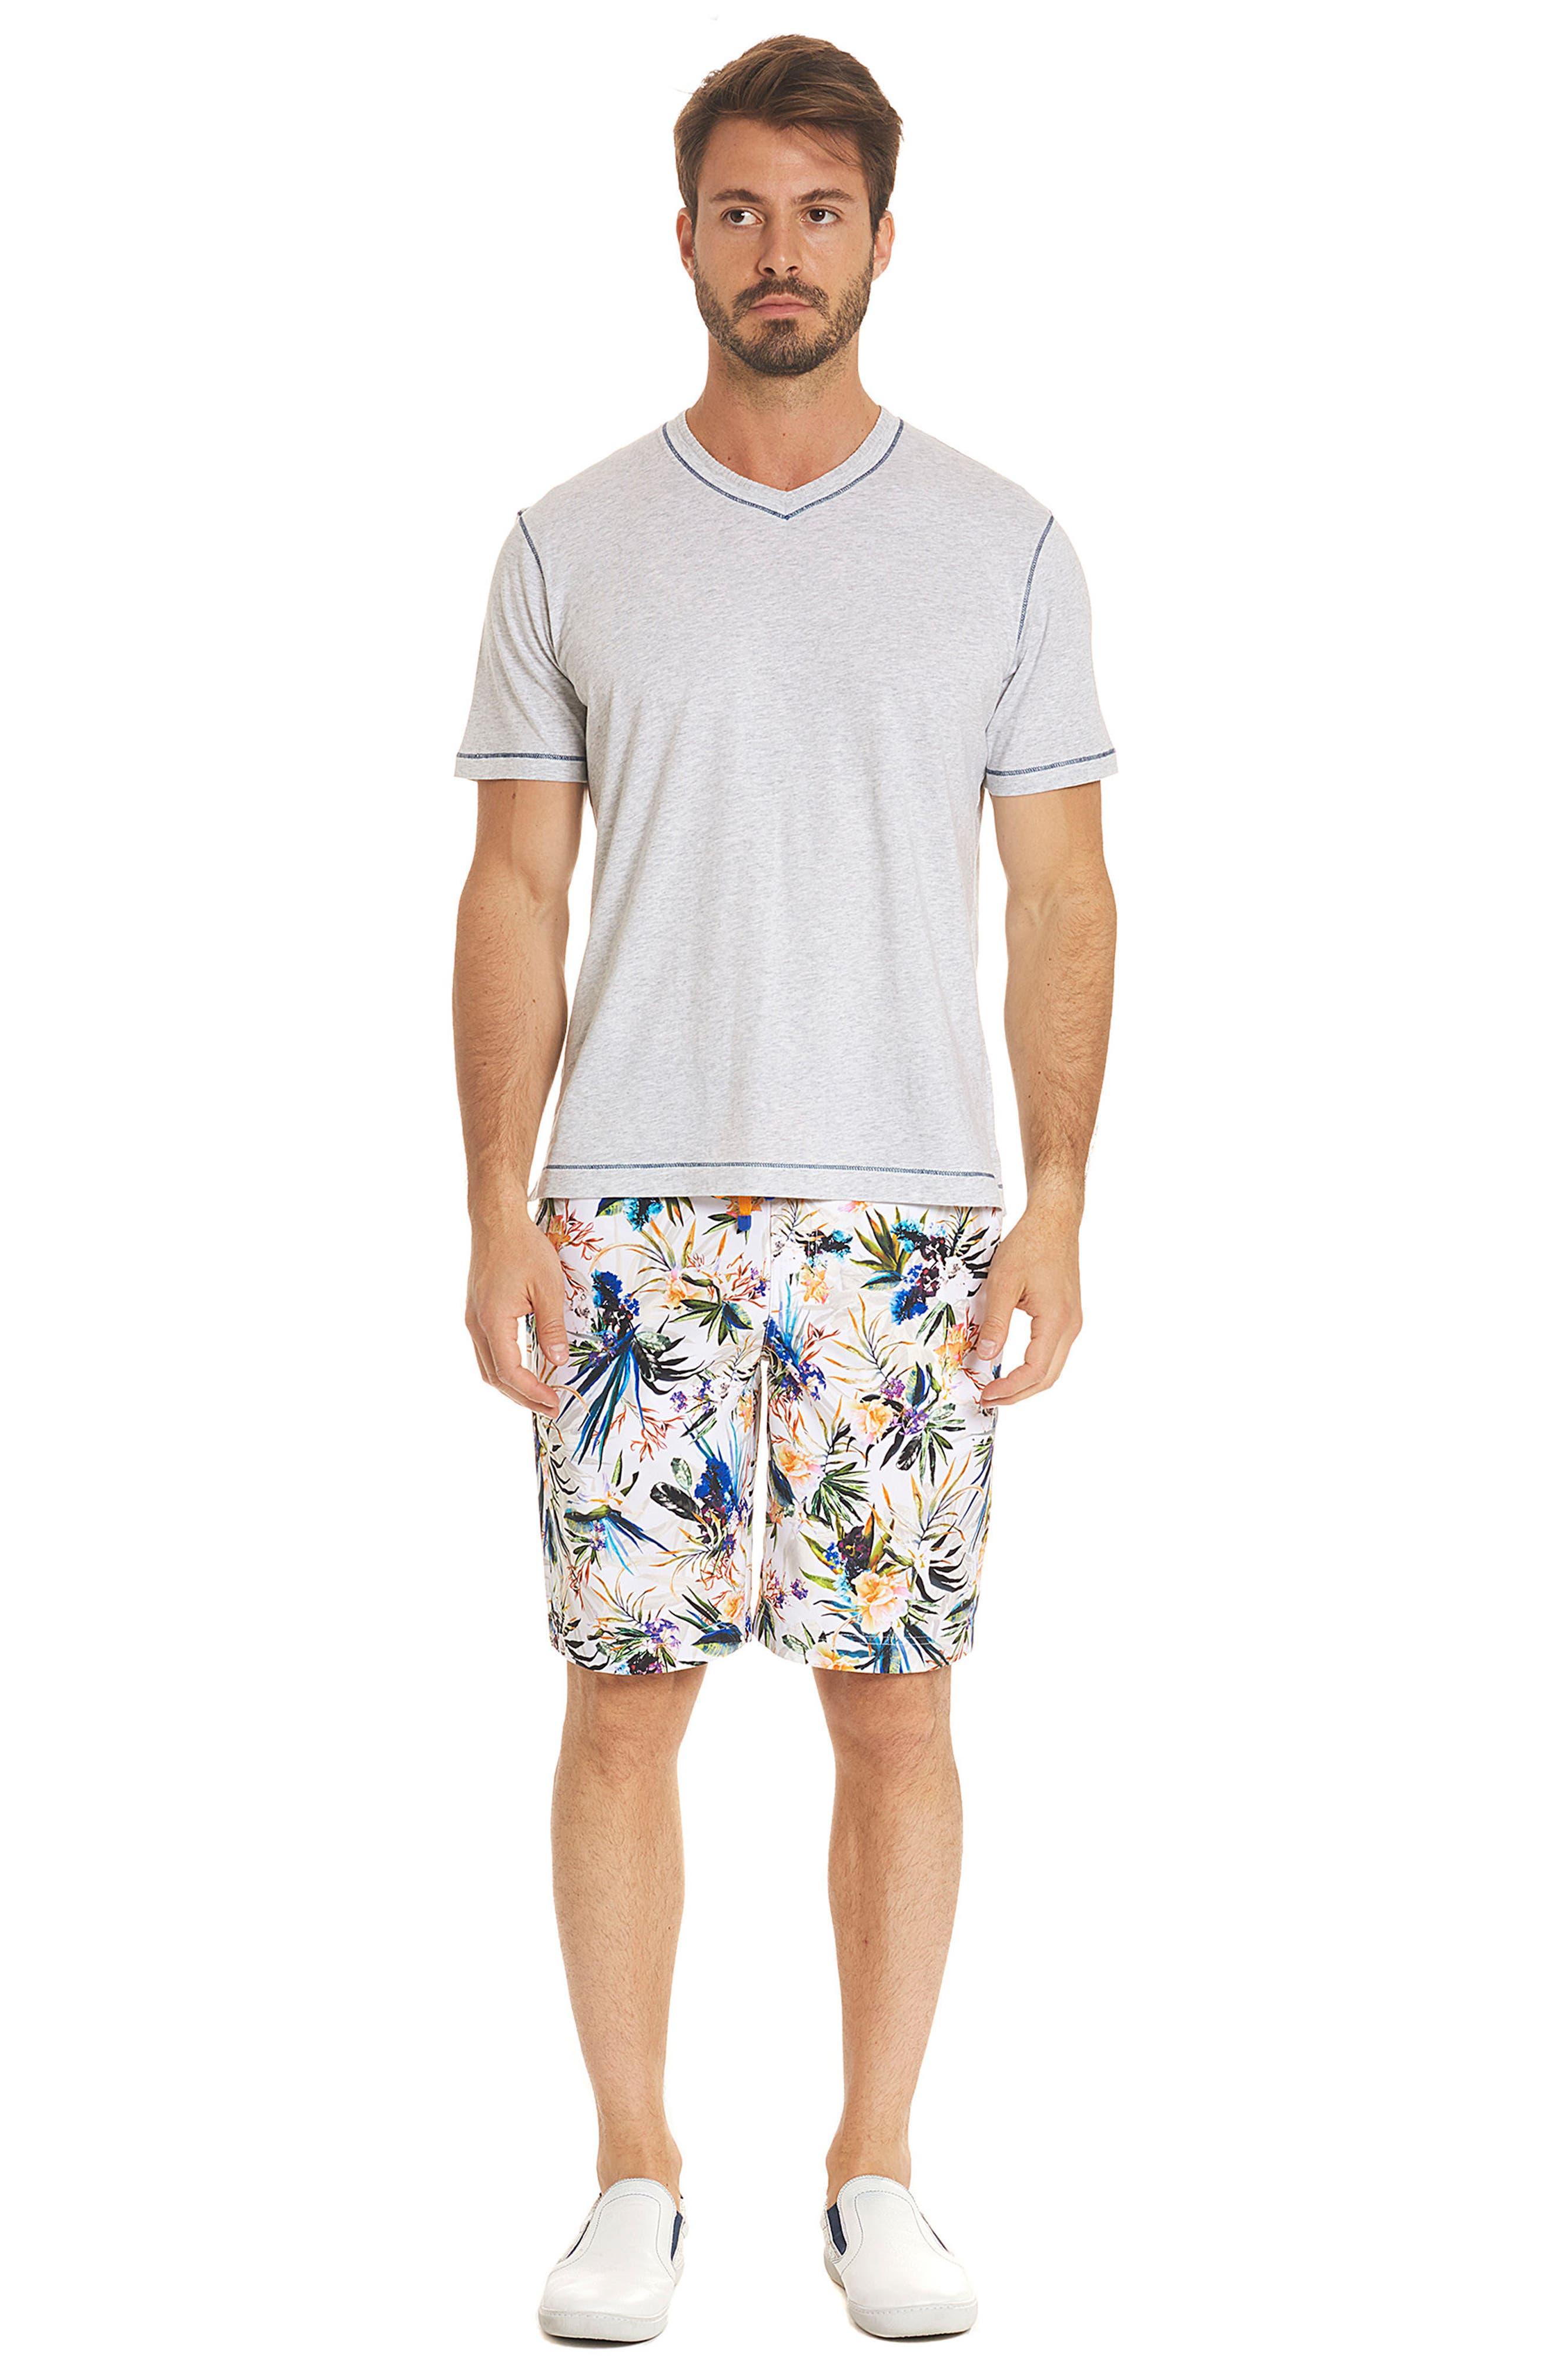 Rumba Board Shorts,                             Alternate thumbnail 7, color,                             250